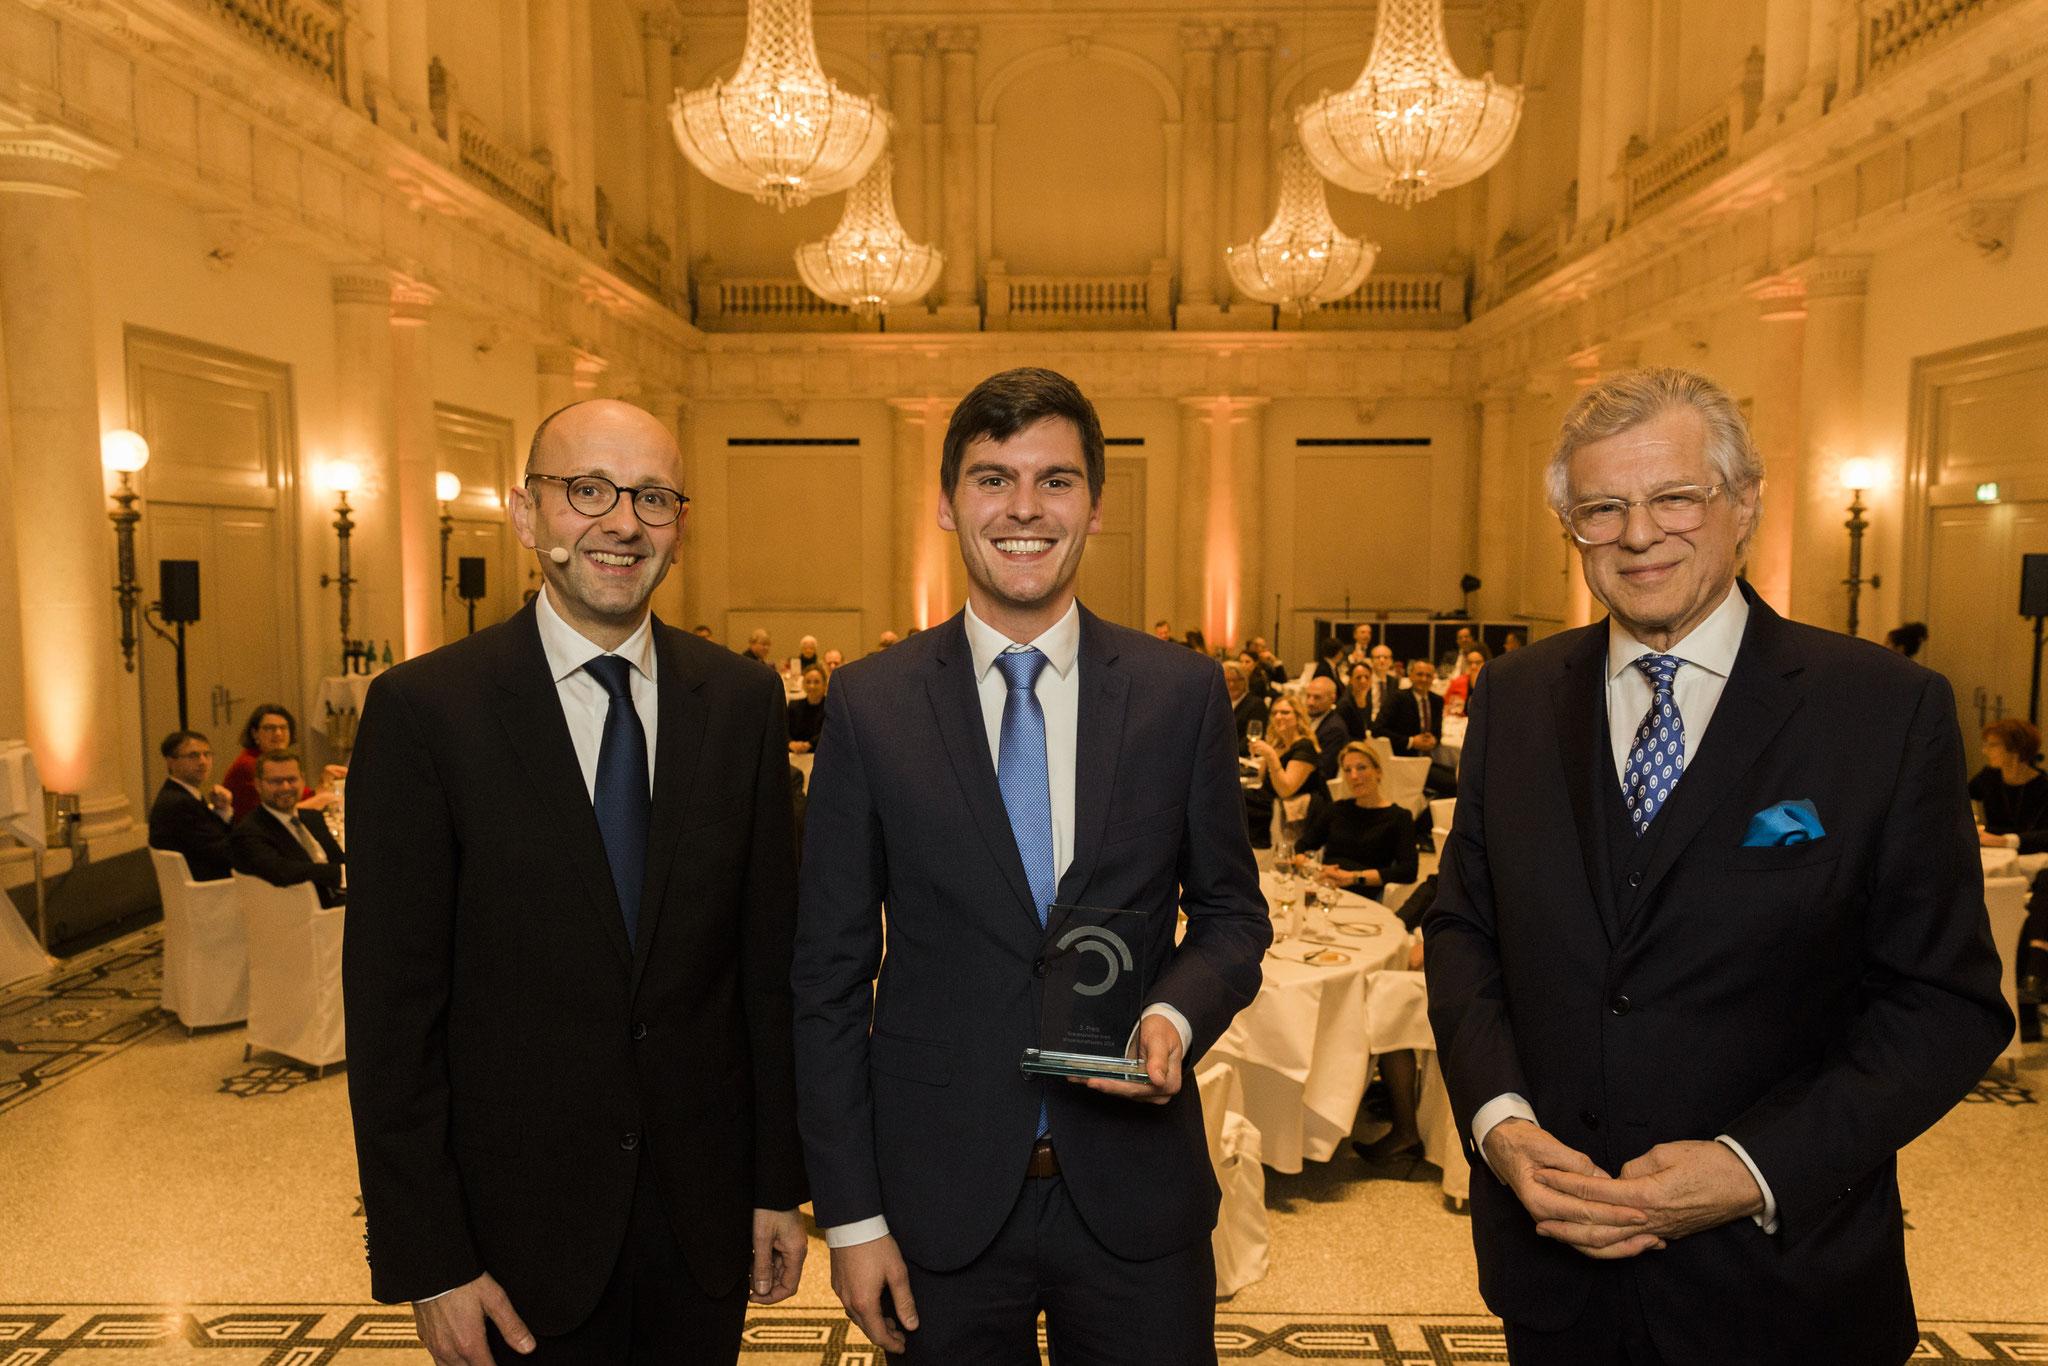 Lucas Flöther, Johannes Richter, third prize Research Award, Bruno Kübler © 2018 Sven Döring